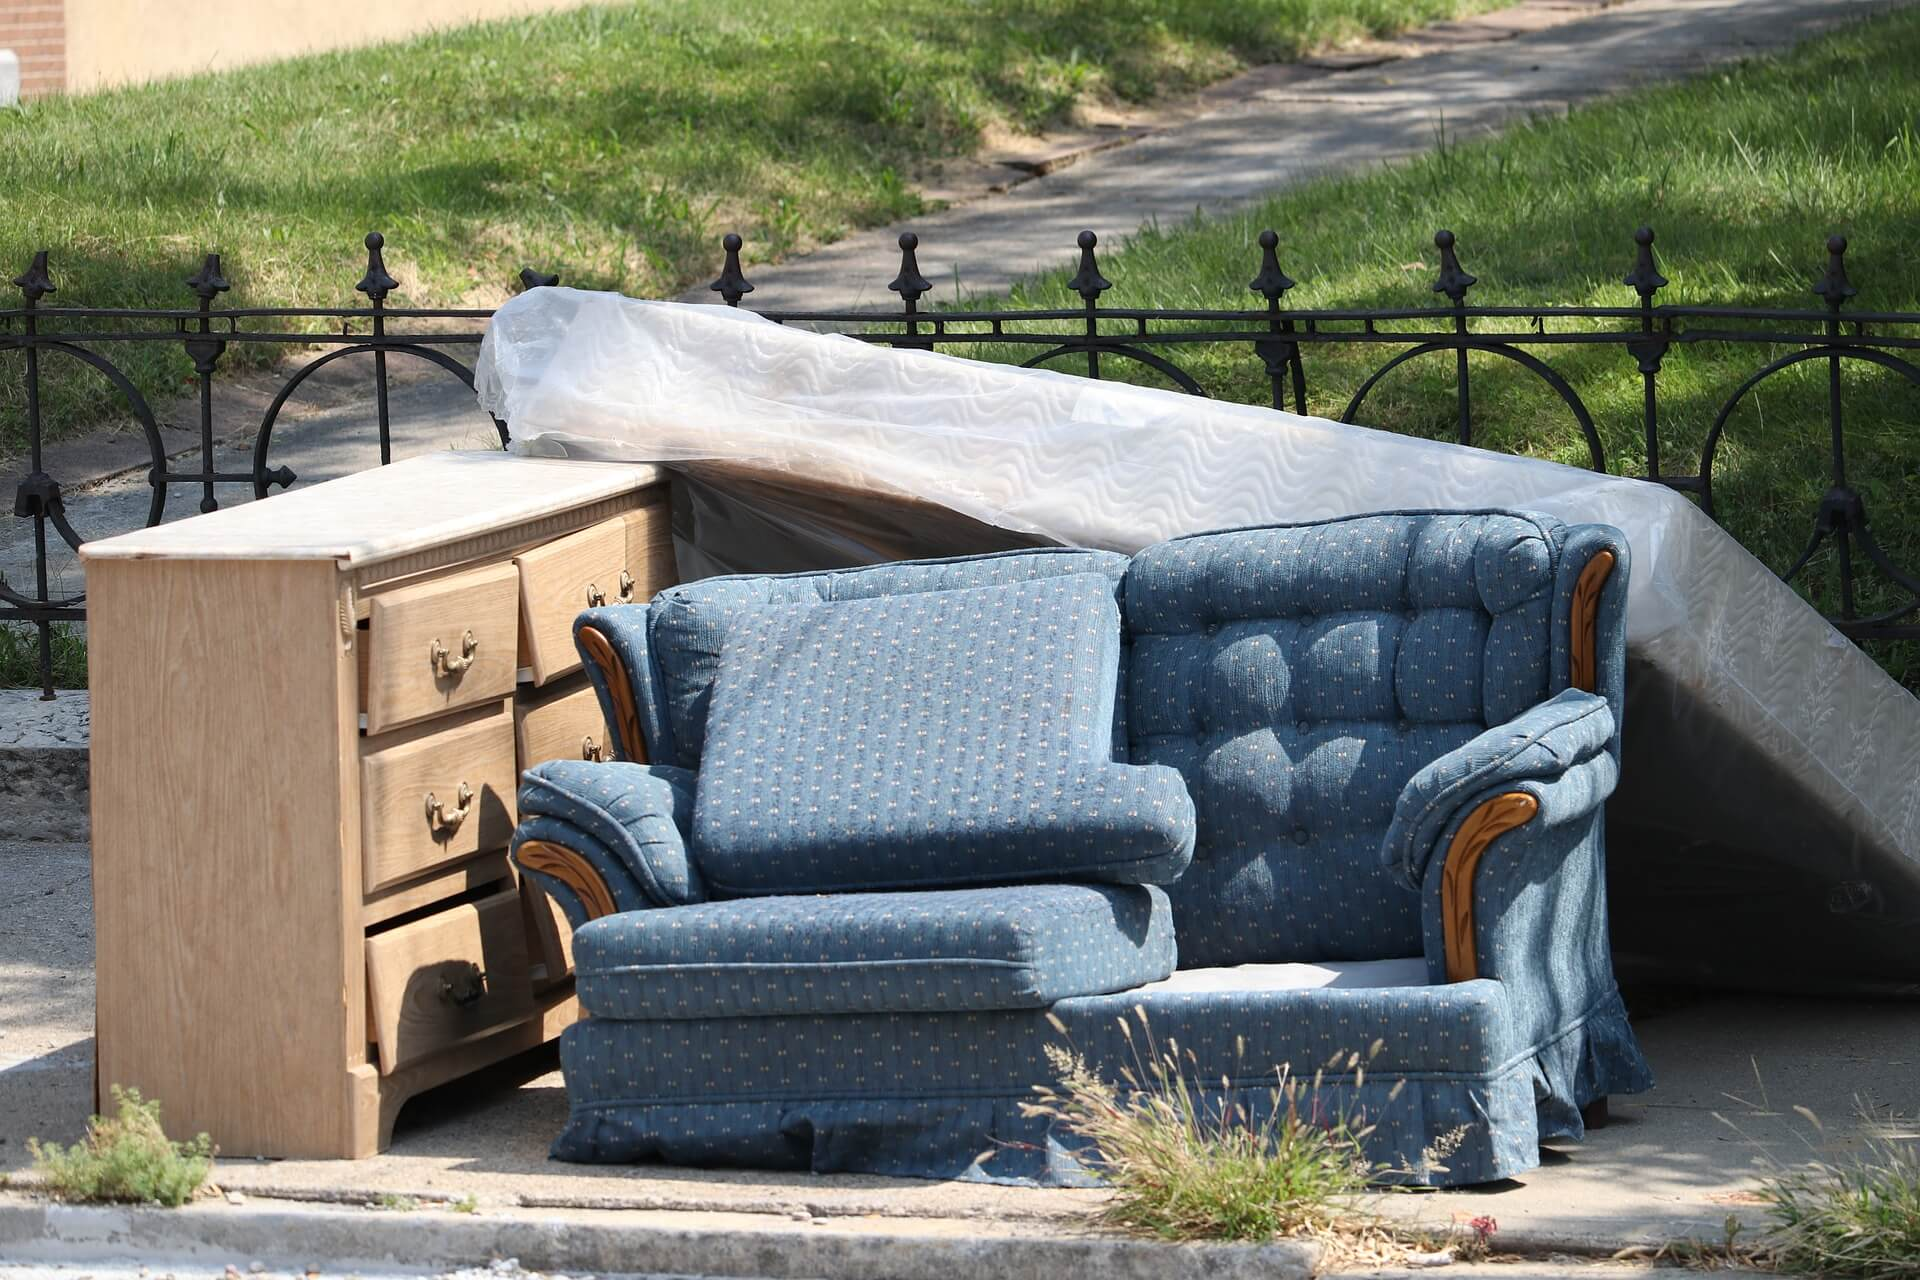 old furniture left on curb